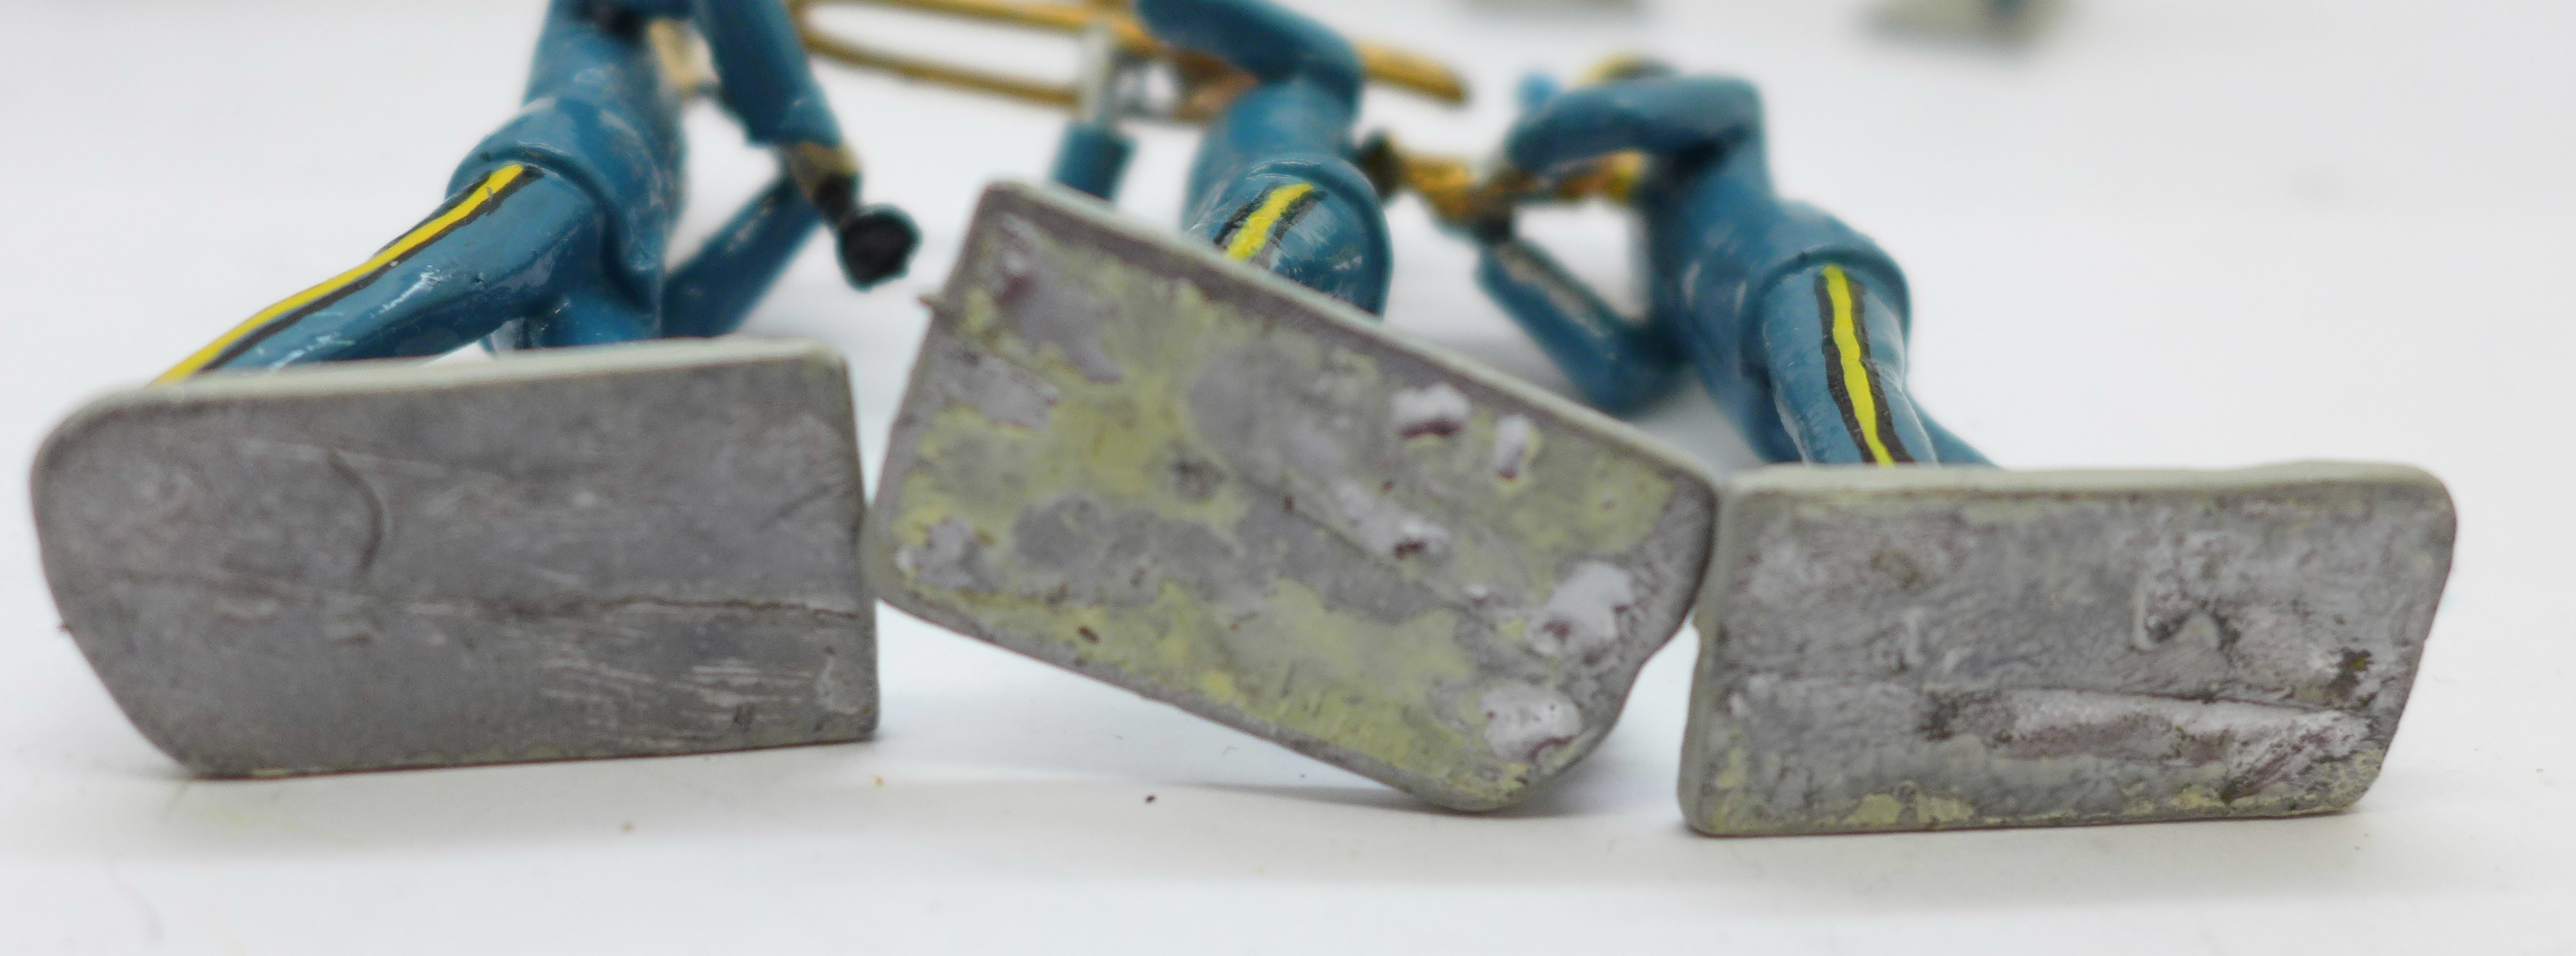 Fifteen metal marching band figures - Image 5 of 5